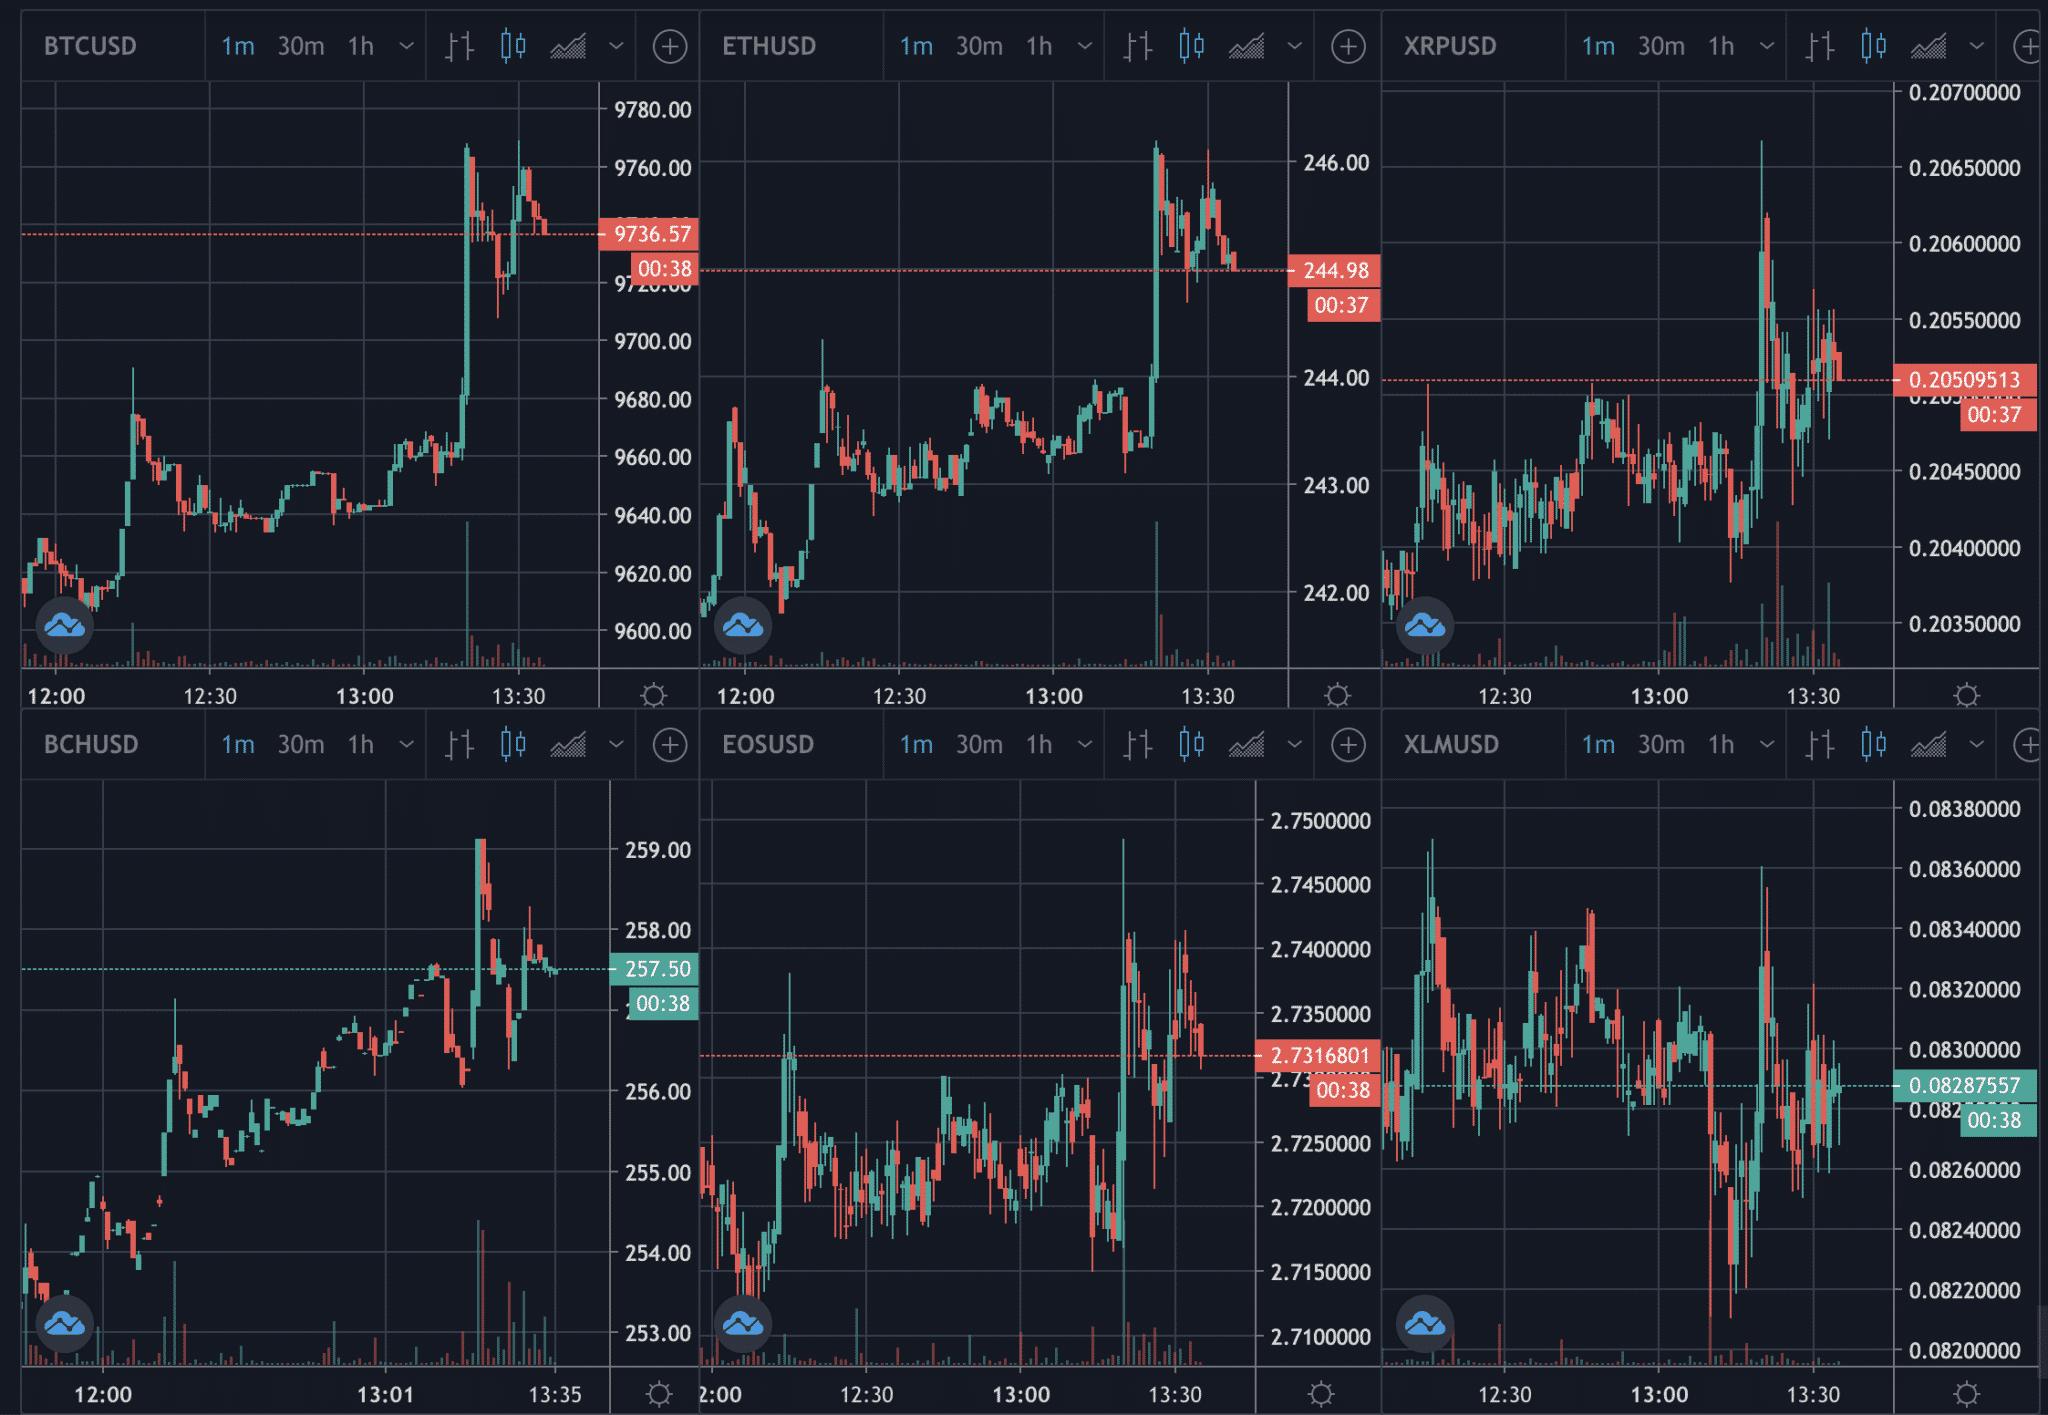 Bitcoin crypto prices, June 2020